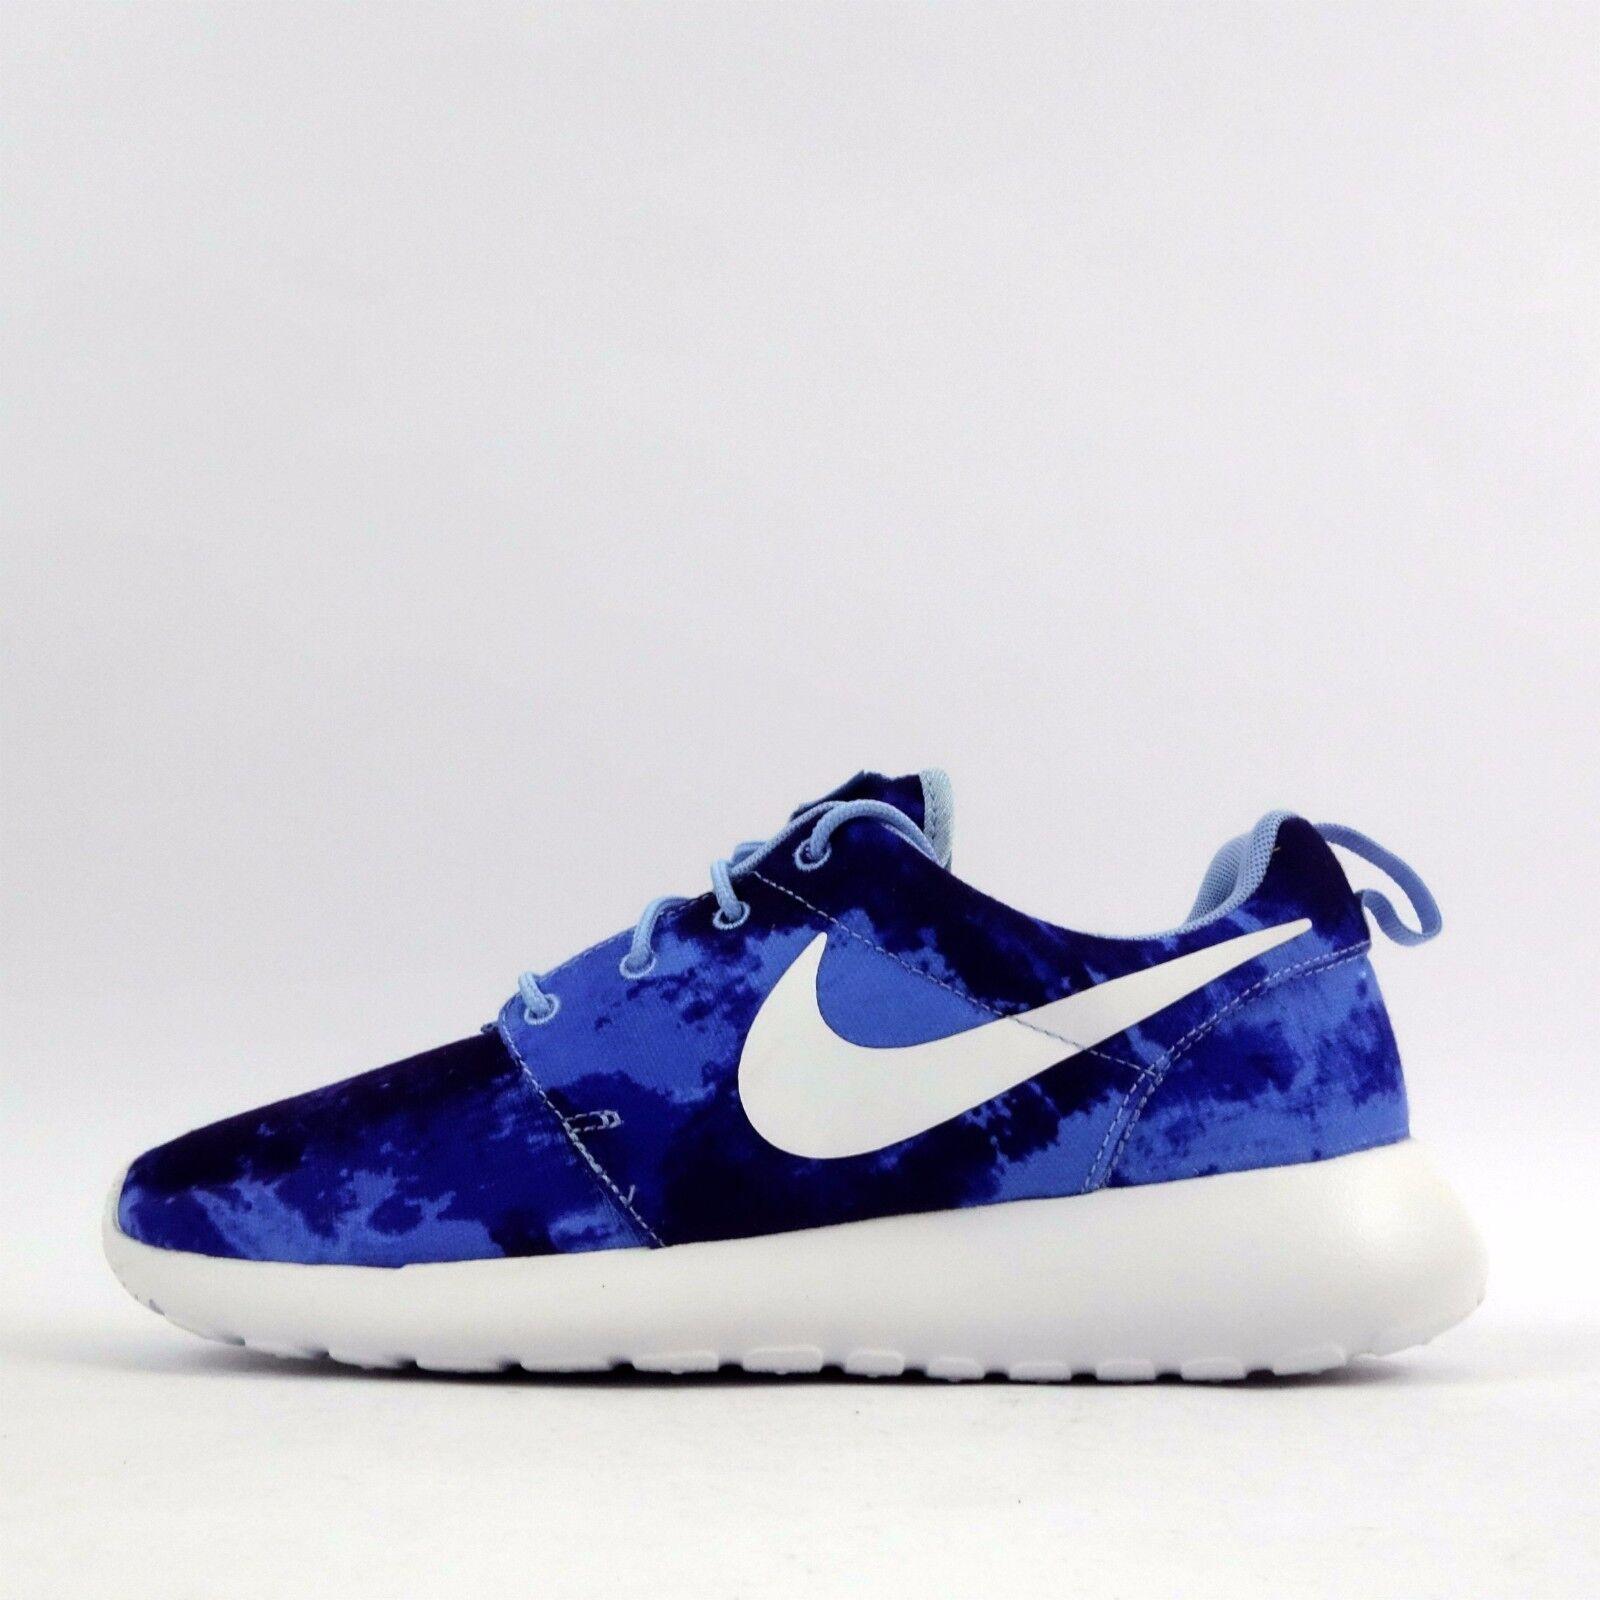 ef02a9f19391d Nike Roshe Roshe Roshe Run One Print Men s Casual Trainers shoes Sneakers  Persian purple 385418 ...